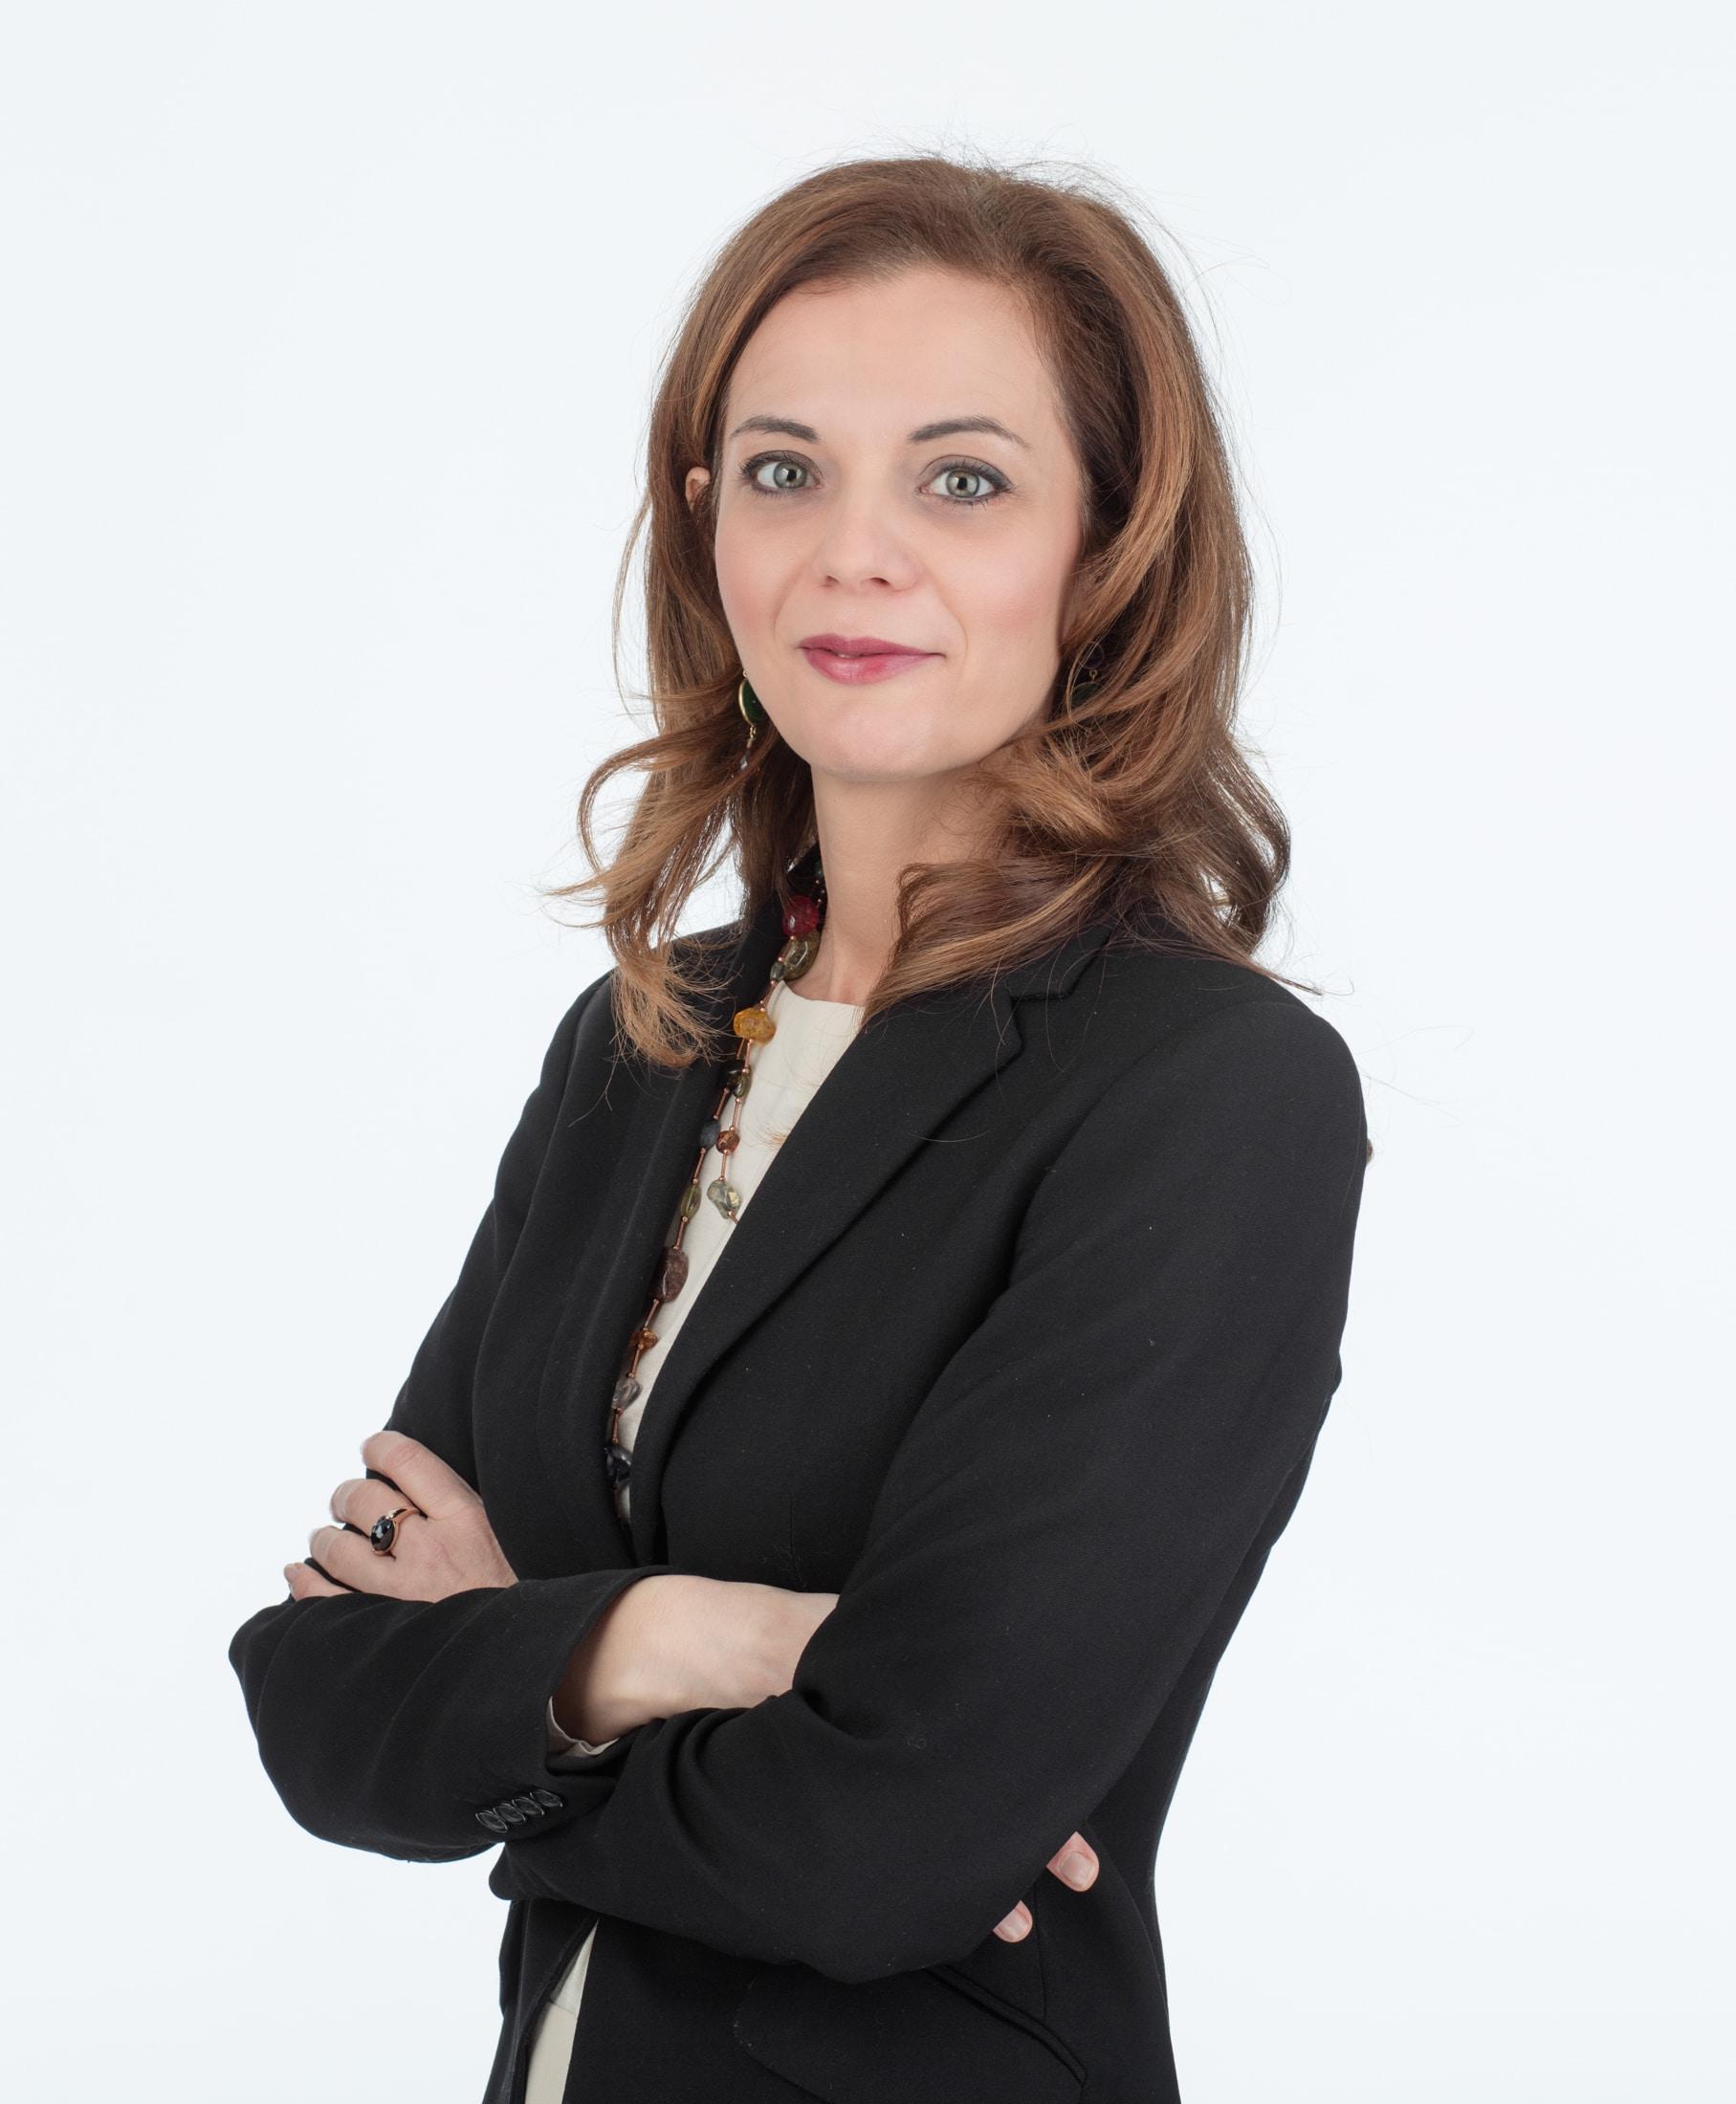 Business Portrait Website-LinkedIn-Publication